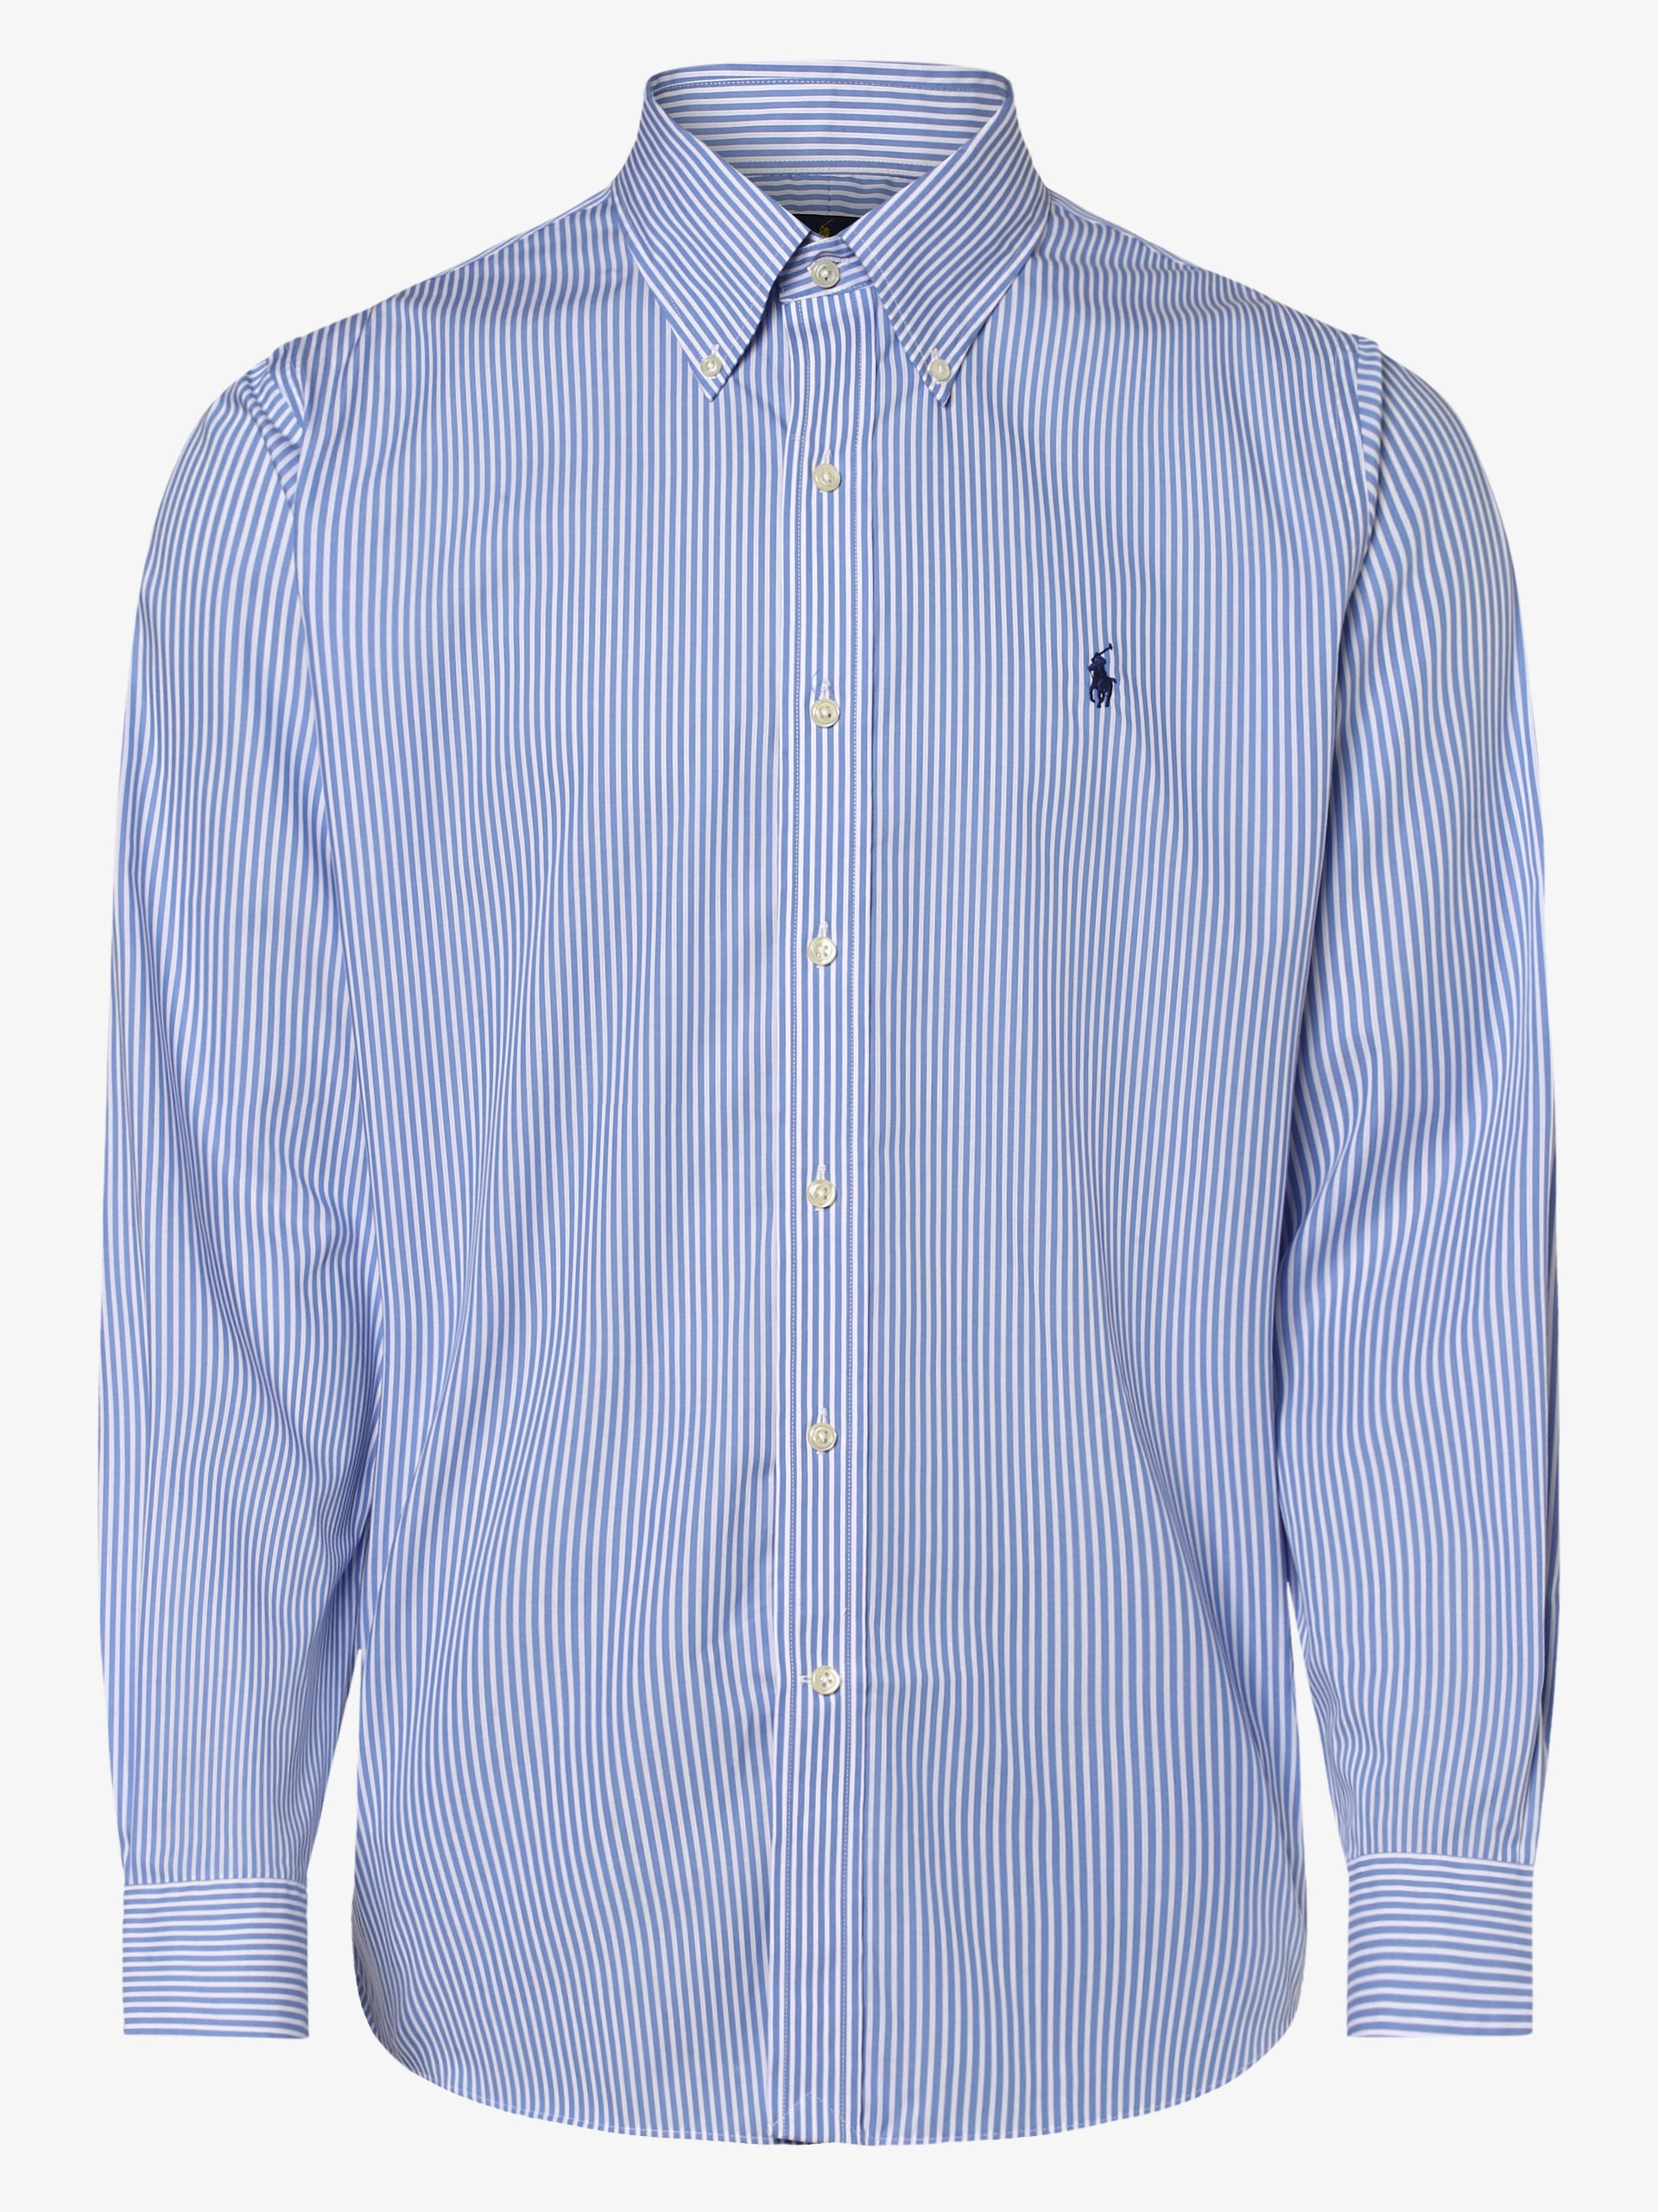 Polo Ralph Lauren Herren Hemd - Bügelleicht - Custom fit